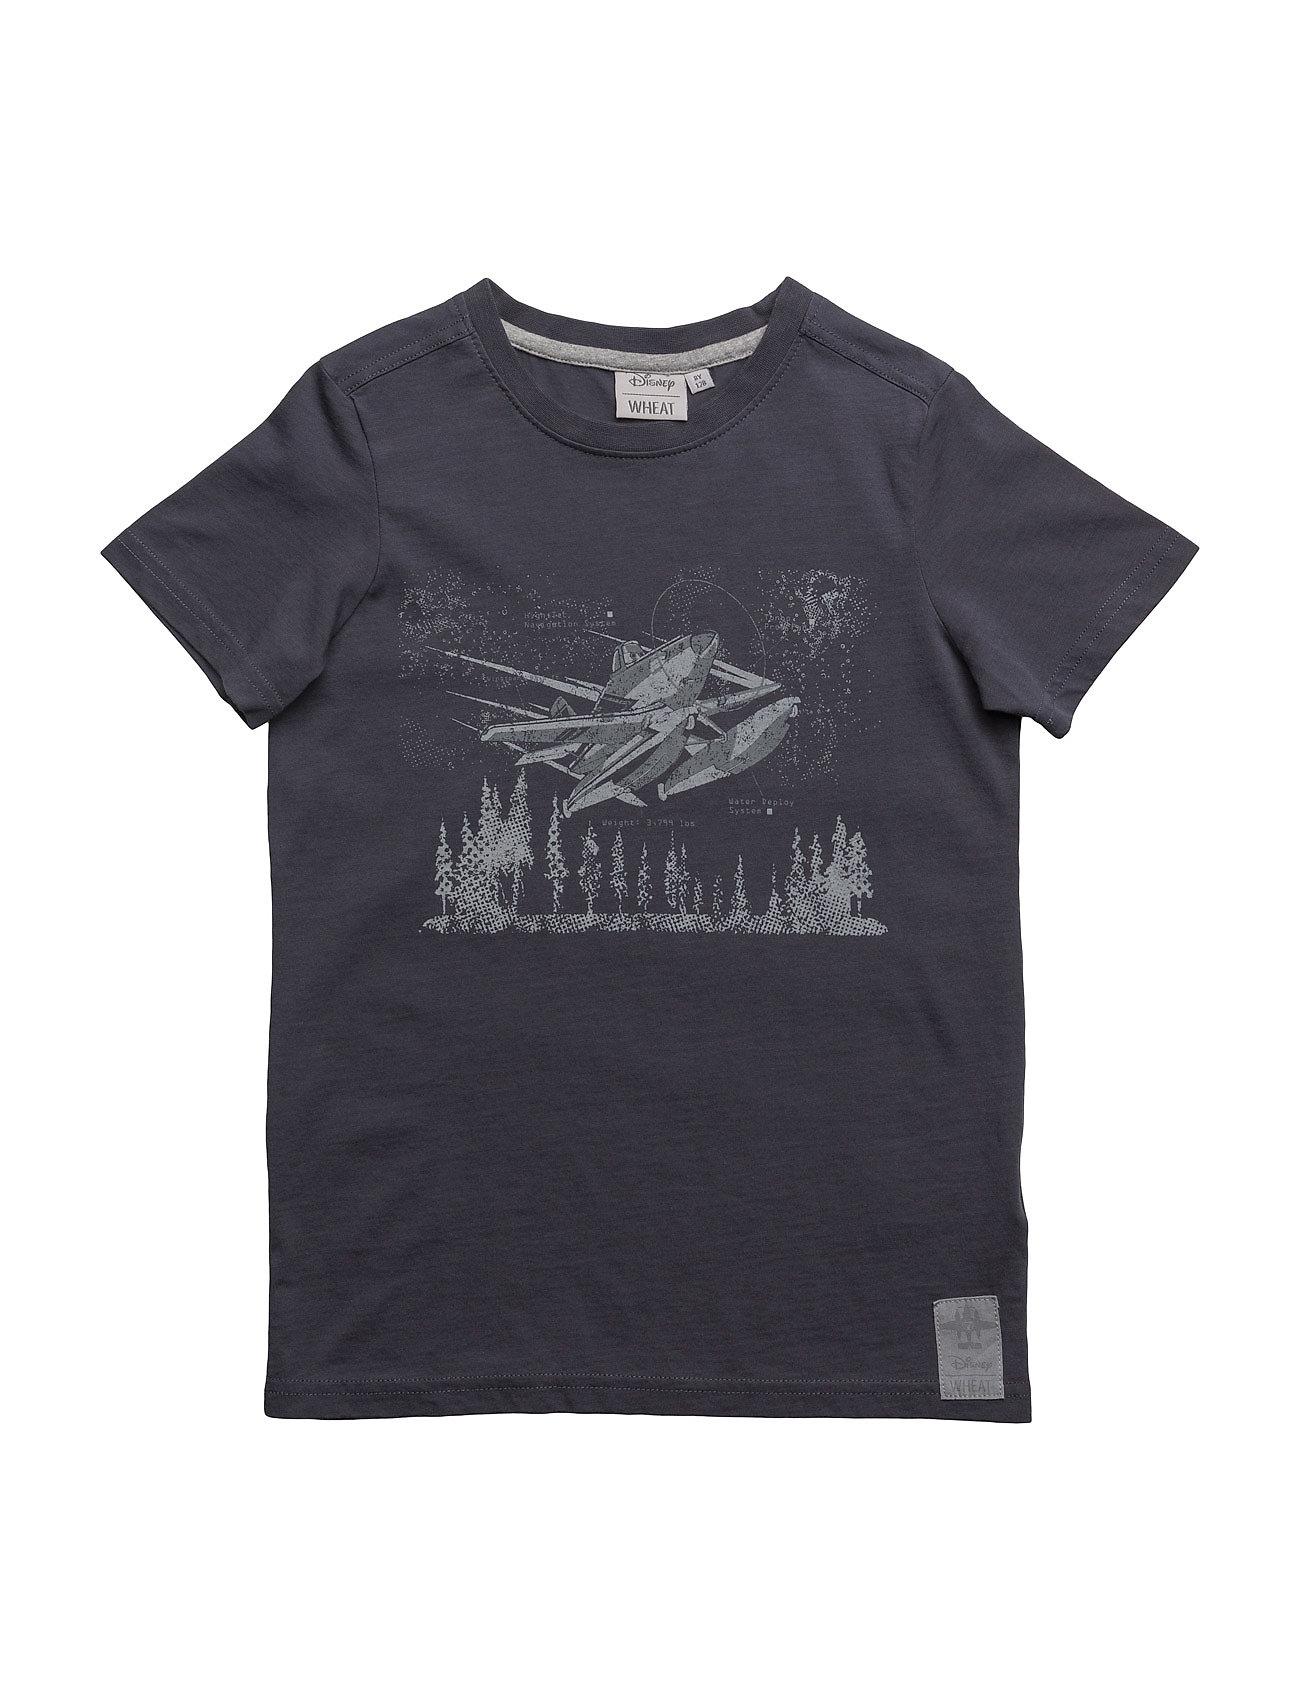 T-Shirt Planes Dusty Disney by Wheat Kortærmede t-shirts til Børn i